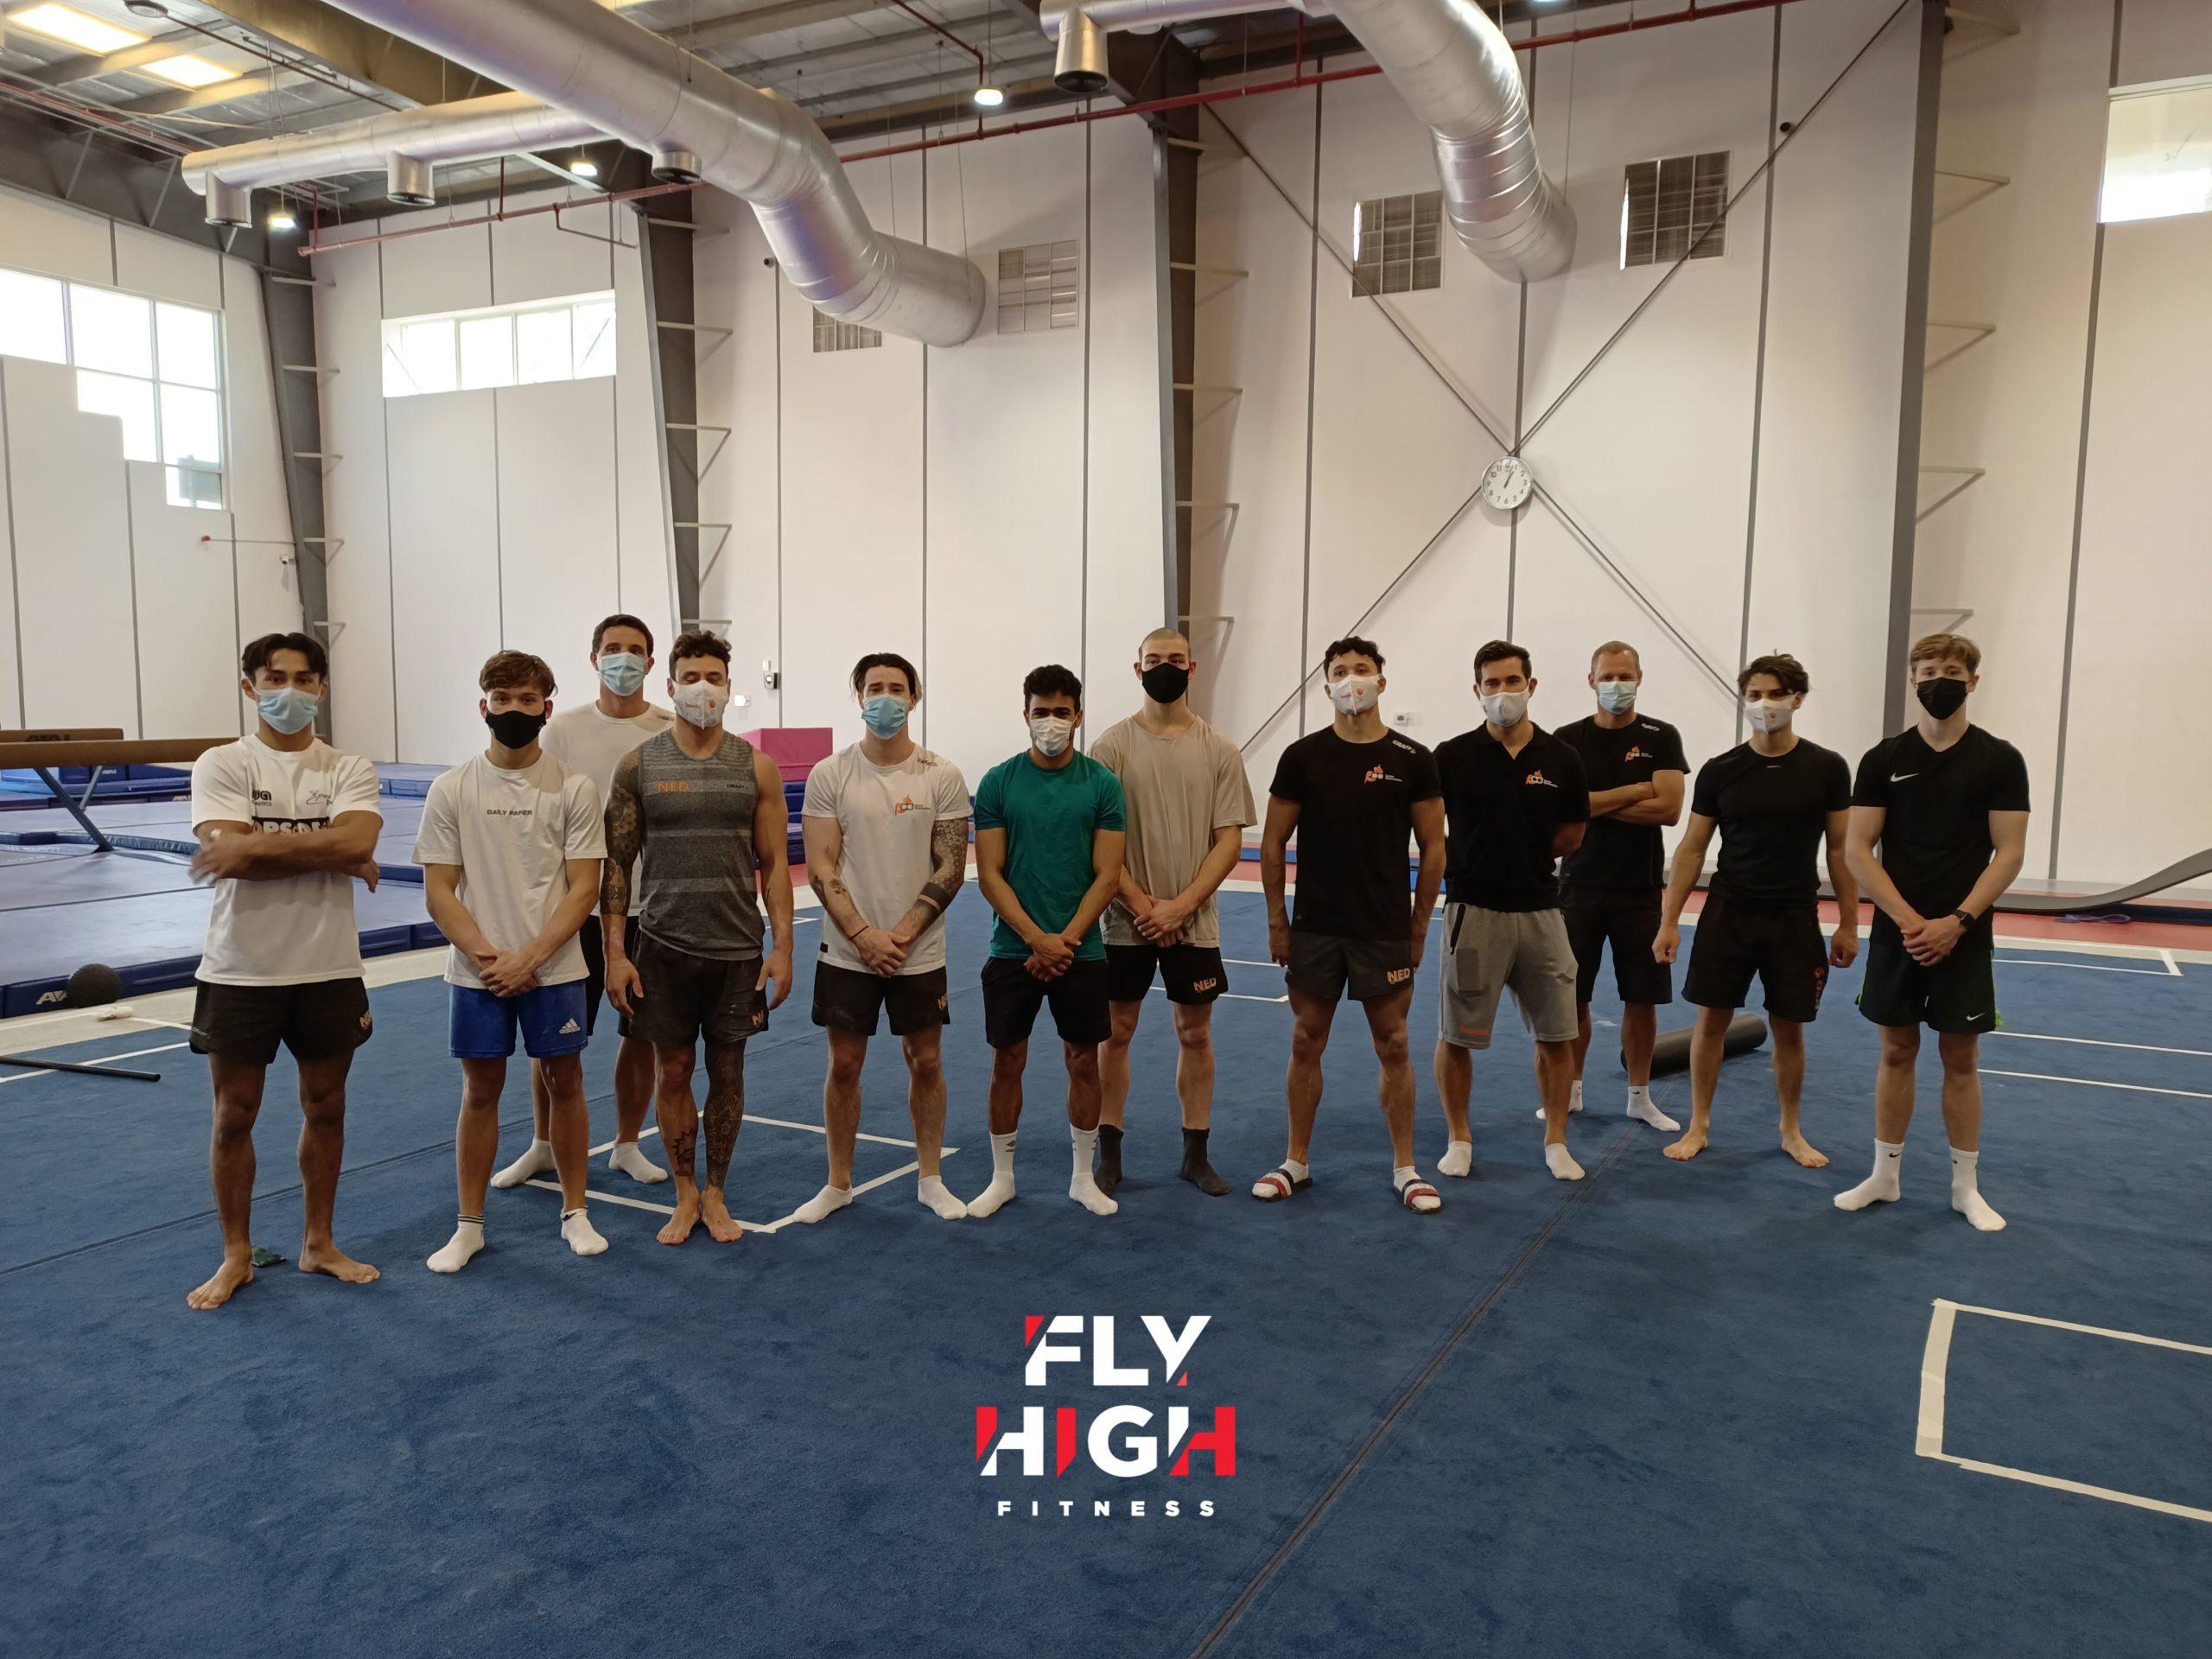 fly high, Flyhigh, Fly High Fitness, Gymnastics, Team Netherlands, Team NL, Olympics 2021, Team Netherlands, Team NL, Team Netherlands Gymnastics, gymnastics, gymnastics facility, leading gymnastics, gymnastics facility, leading facility, leading gymnastics facility, gymnastics, gymnastics kids, gymnastics adult